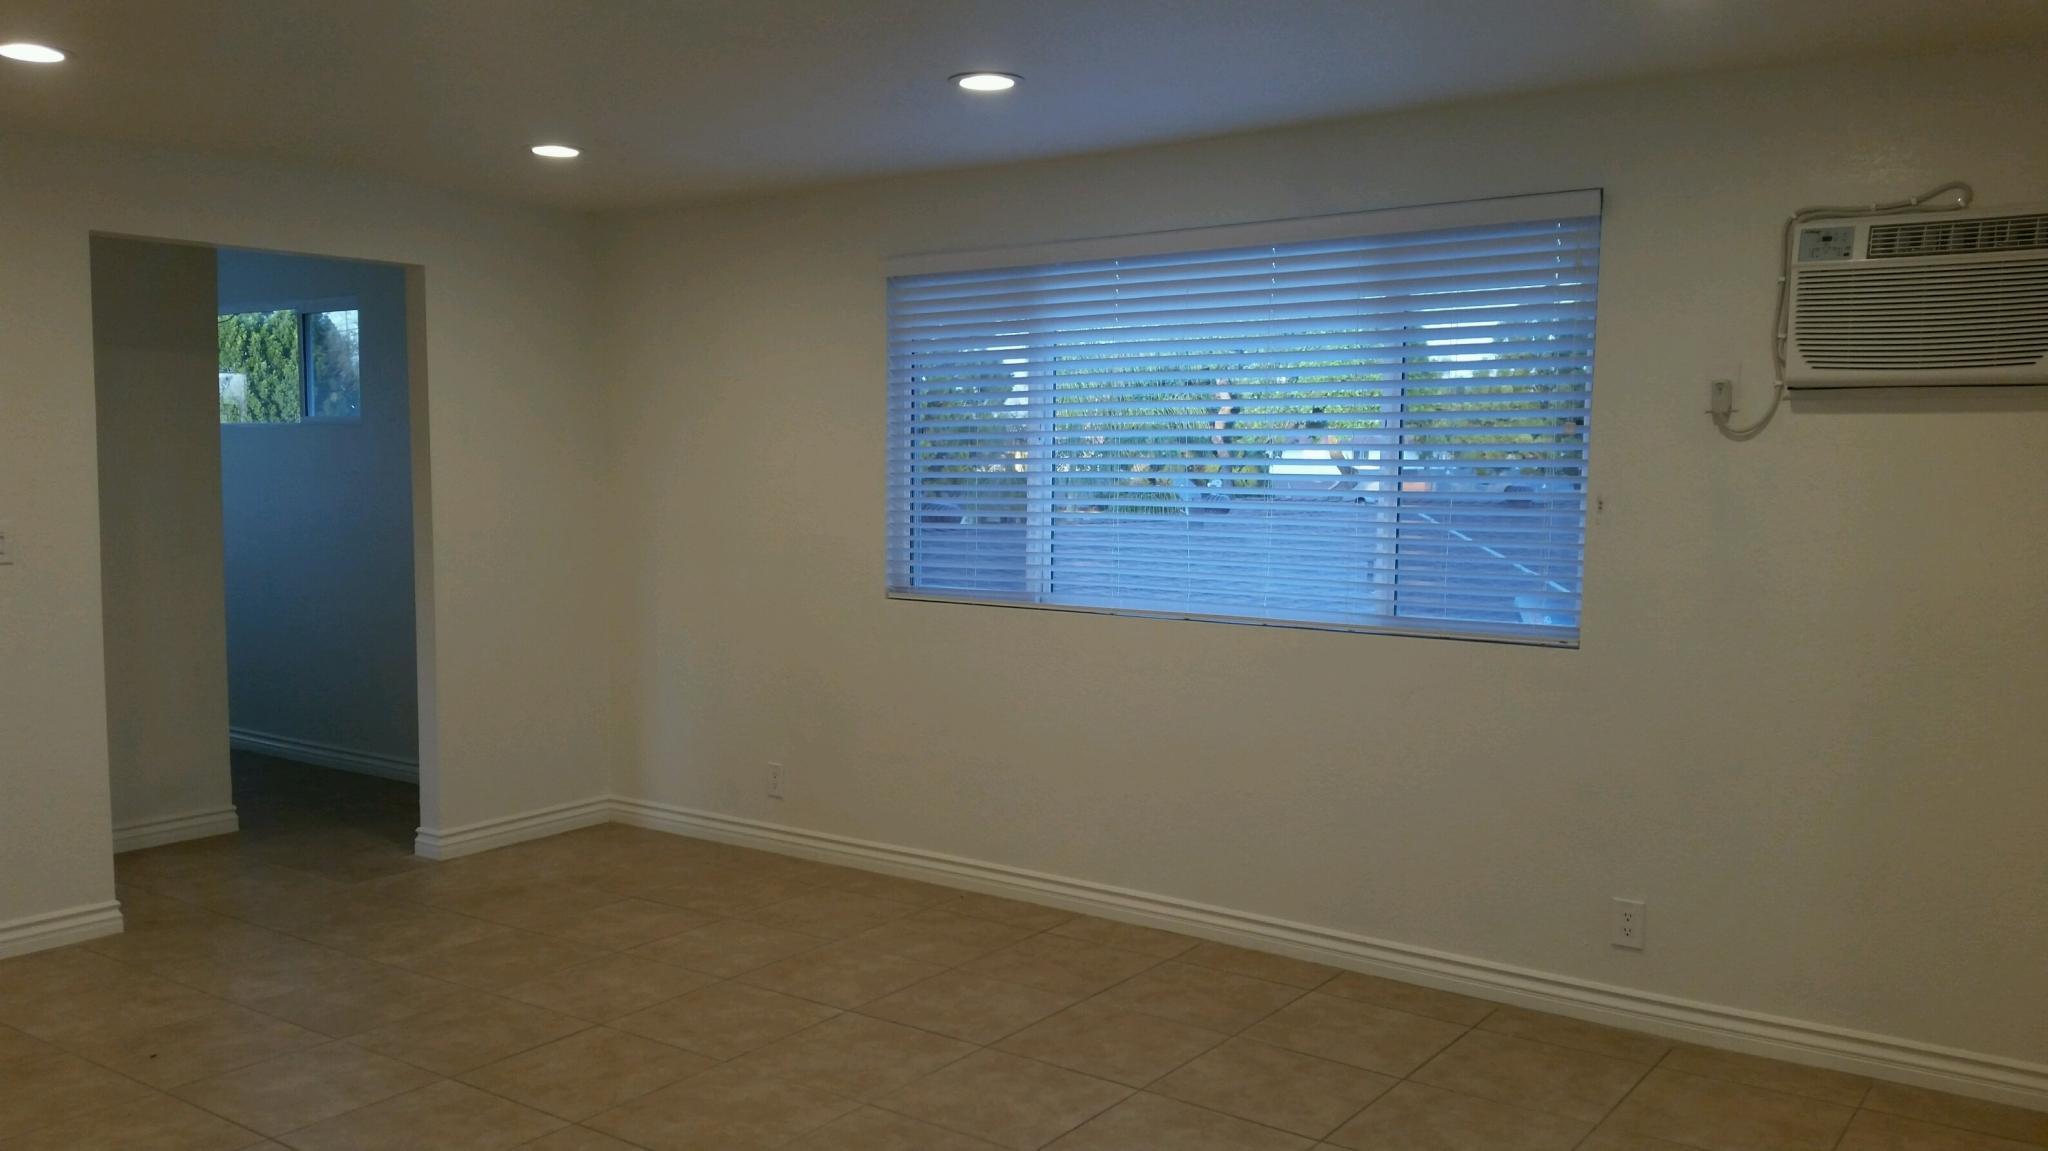 139 S Ridgeway St #4, Anaheim, CA 92804 For Rent | Trulia